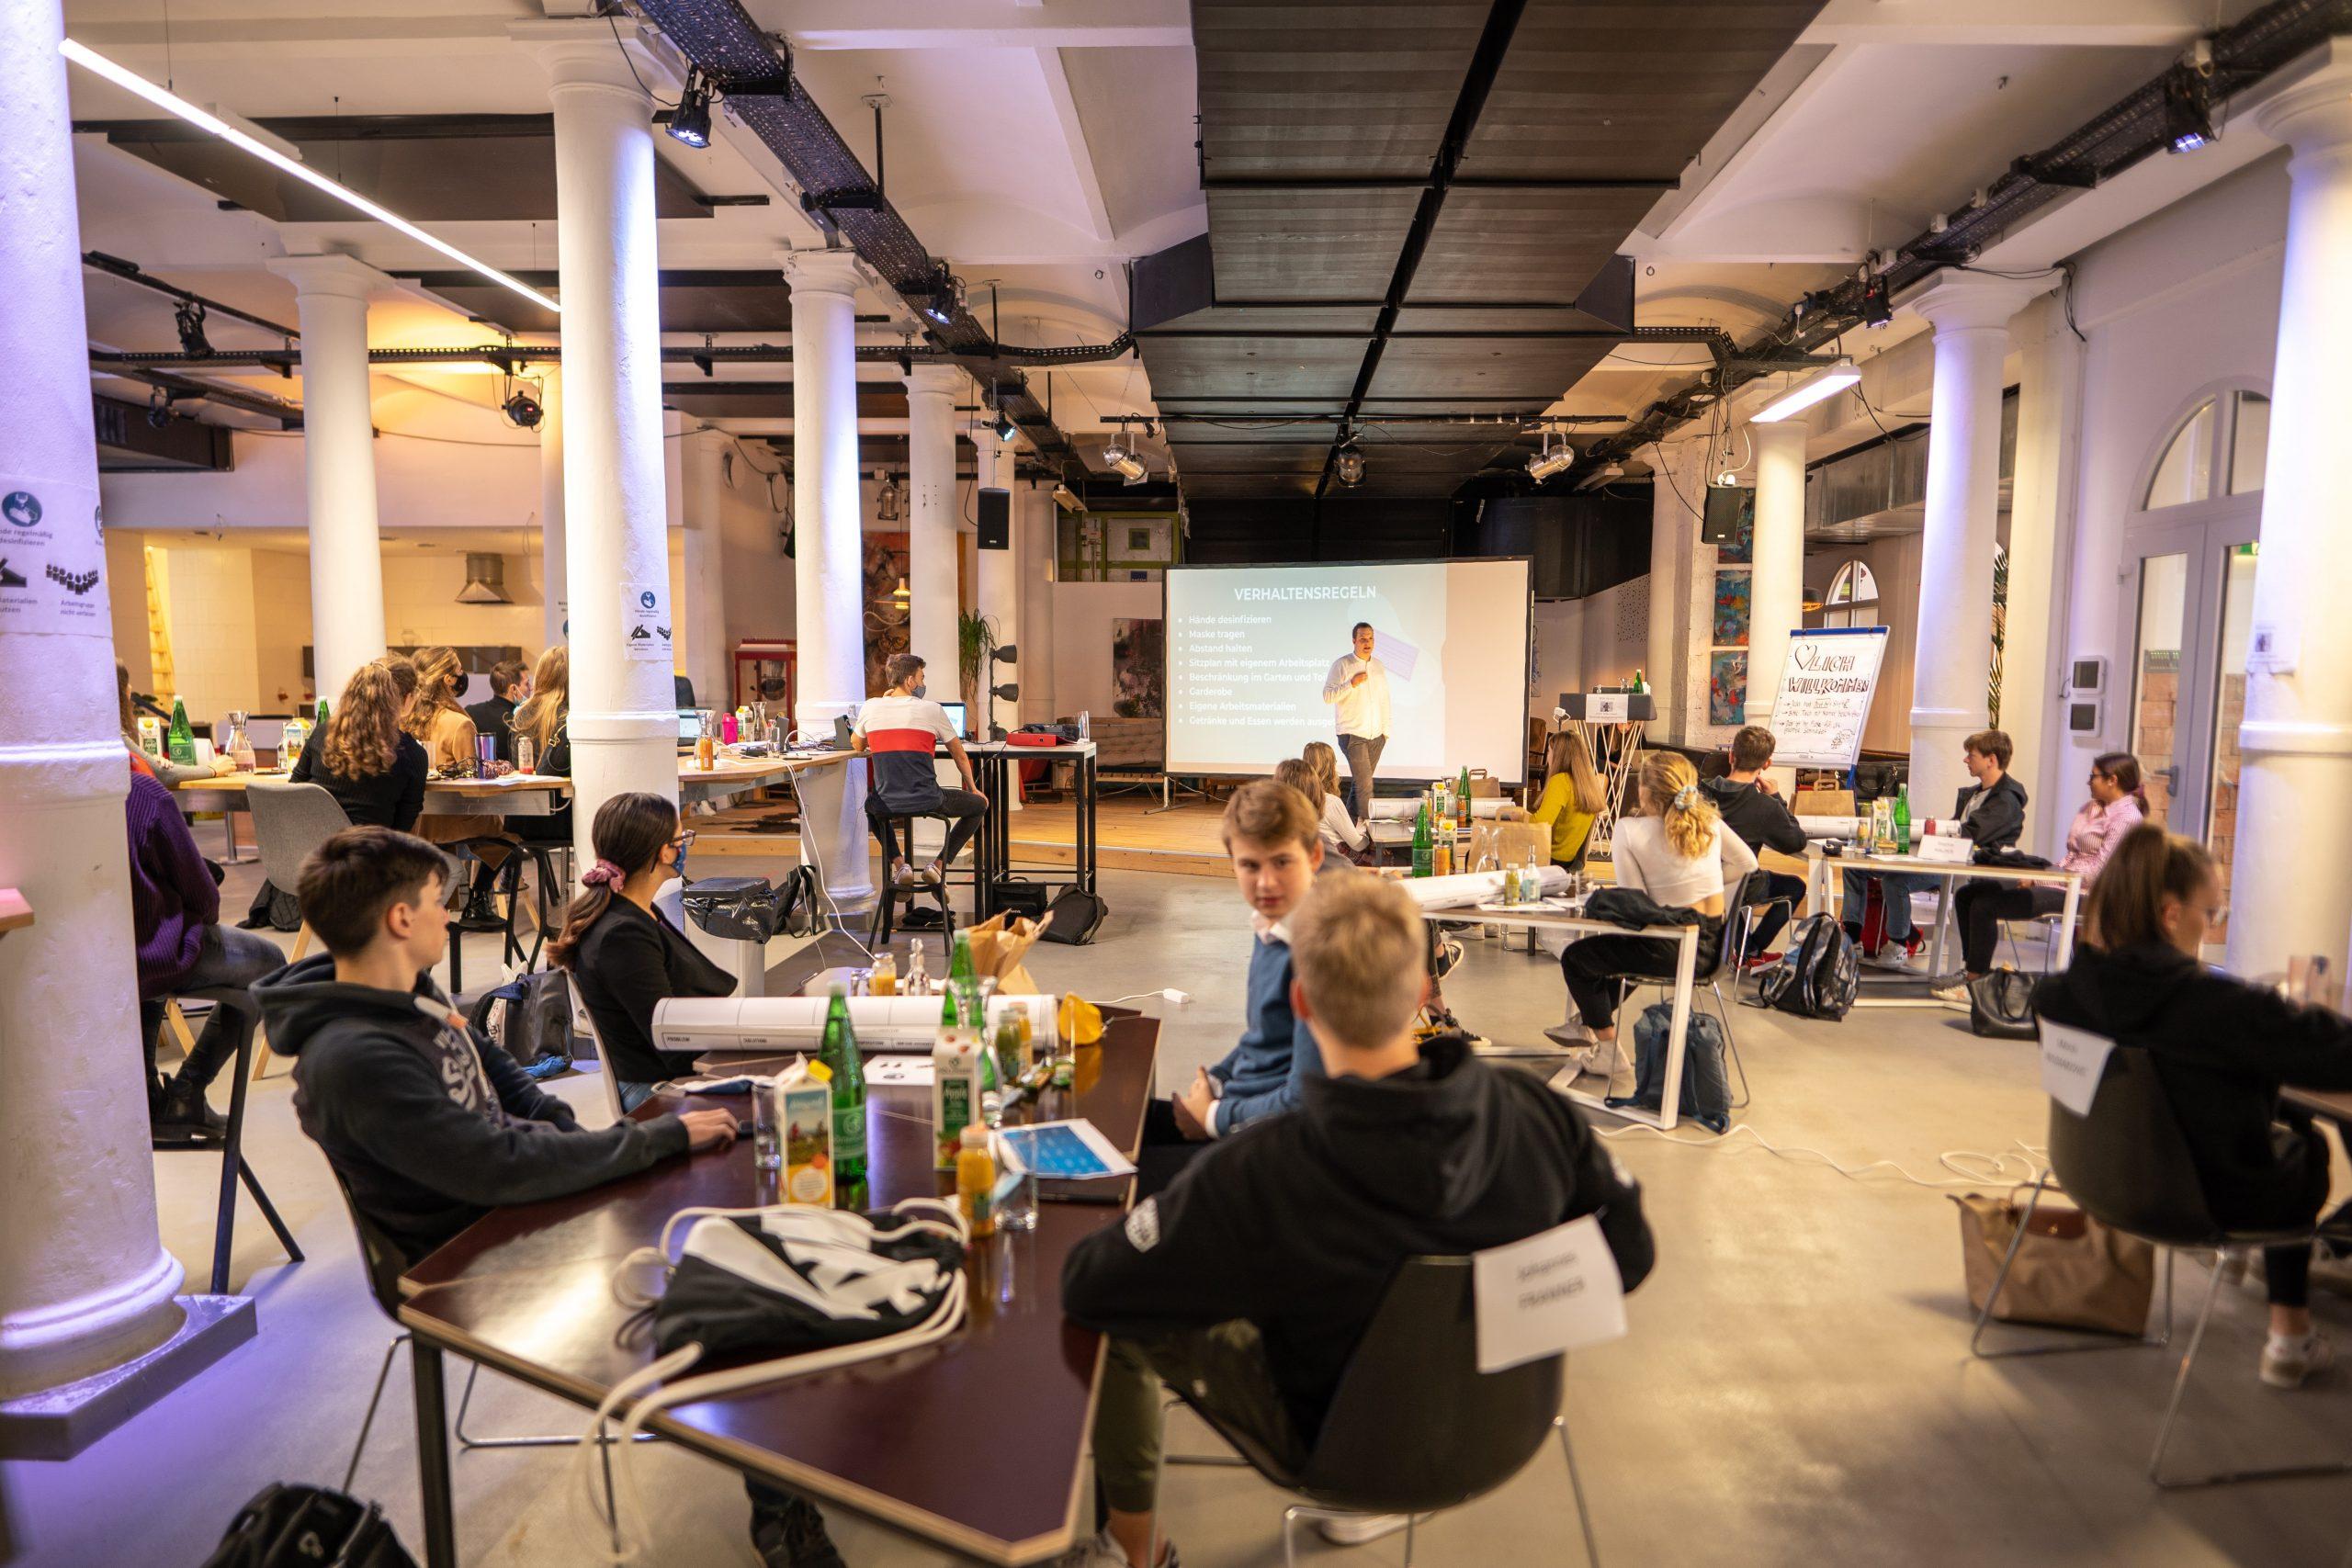 Youth Entrepreneurship Week